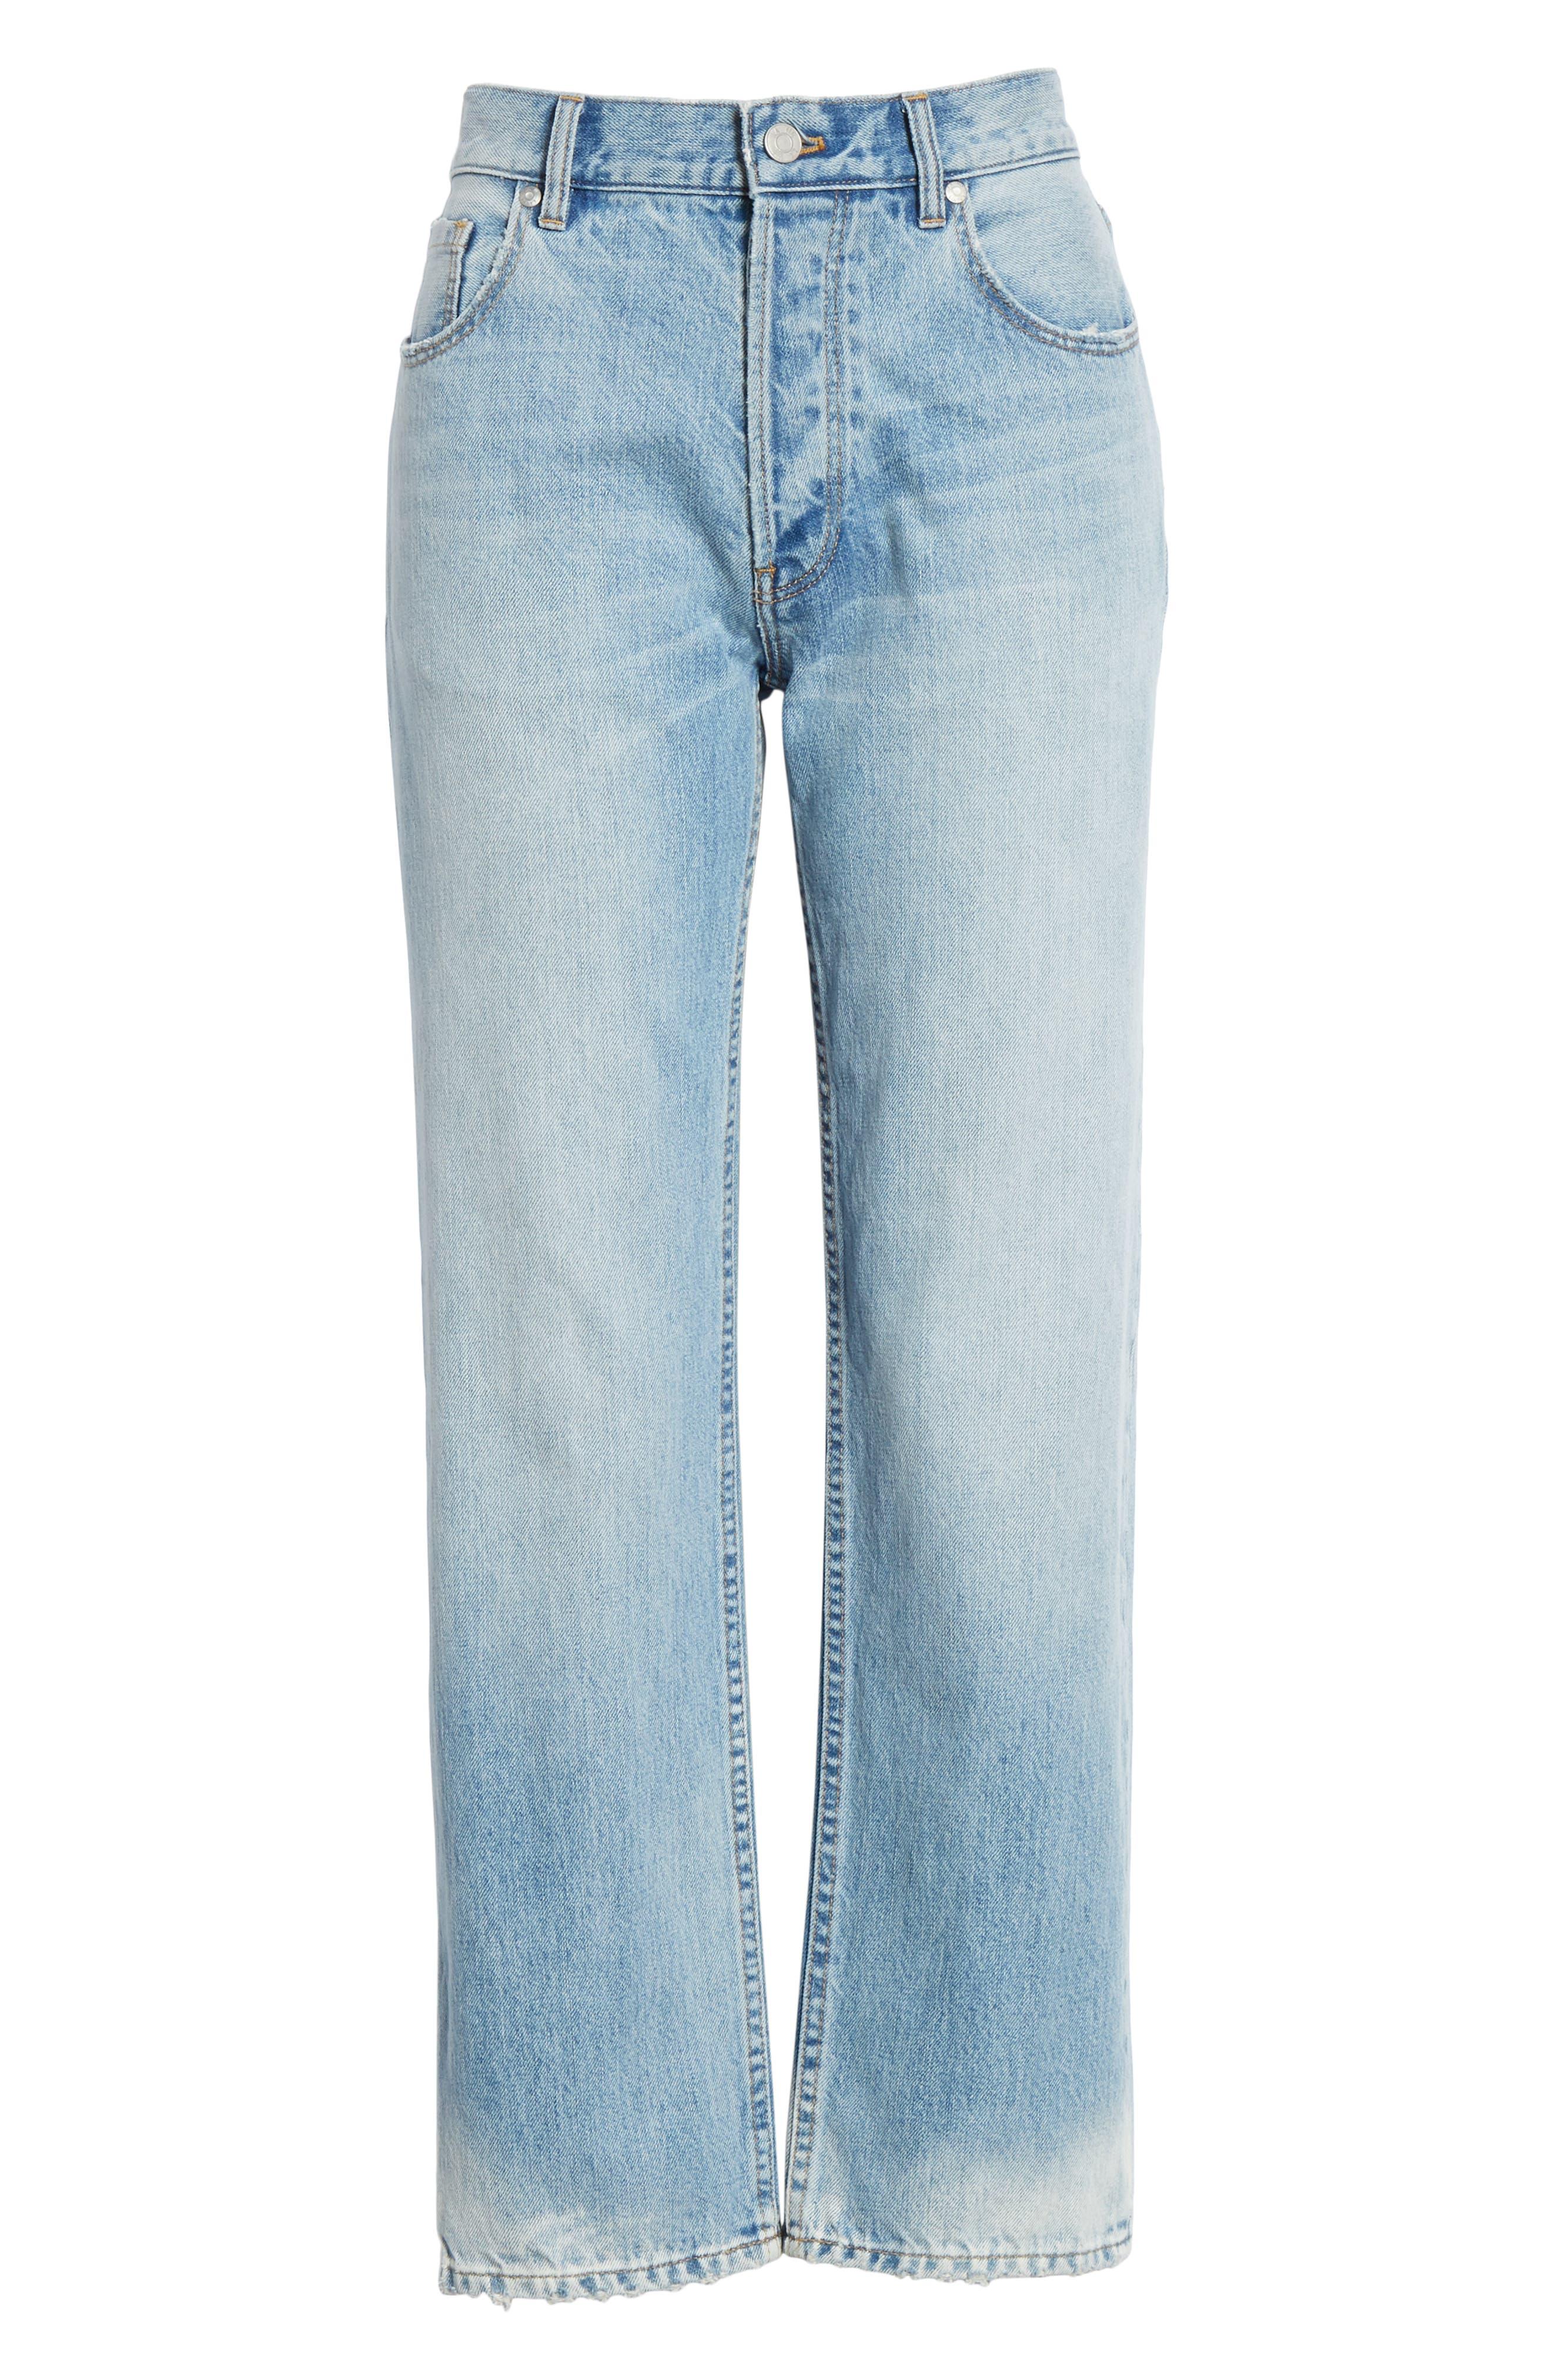 LA VIE REBECCA TAYLOR, Sylvie High Waist Jeans, Alternate thumbnail 7, color, CHANTAL WASH